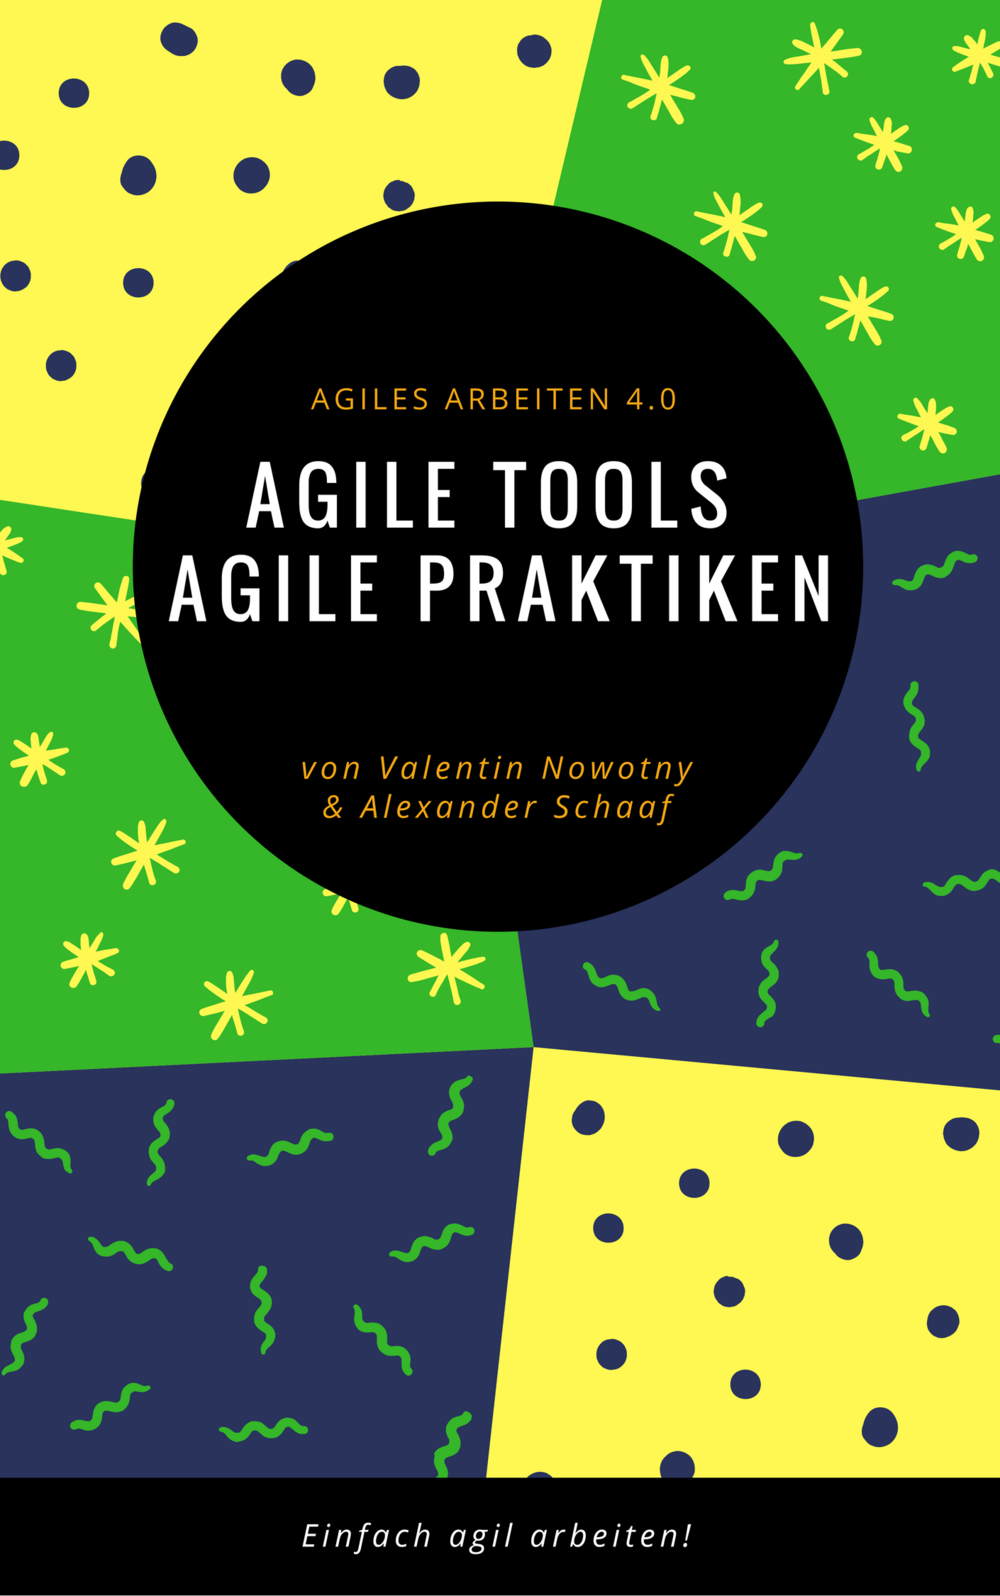 Agile Tools, Agile Praktiken (1).png